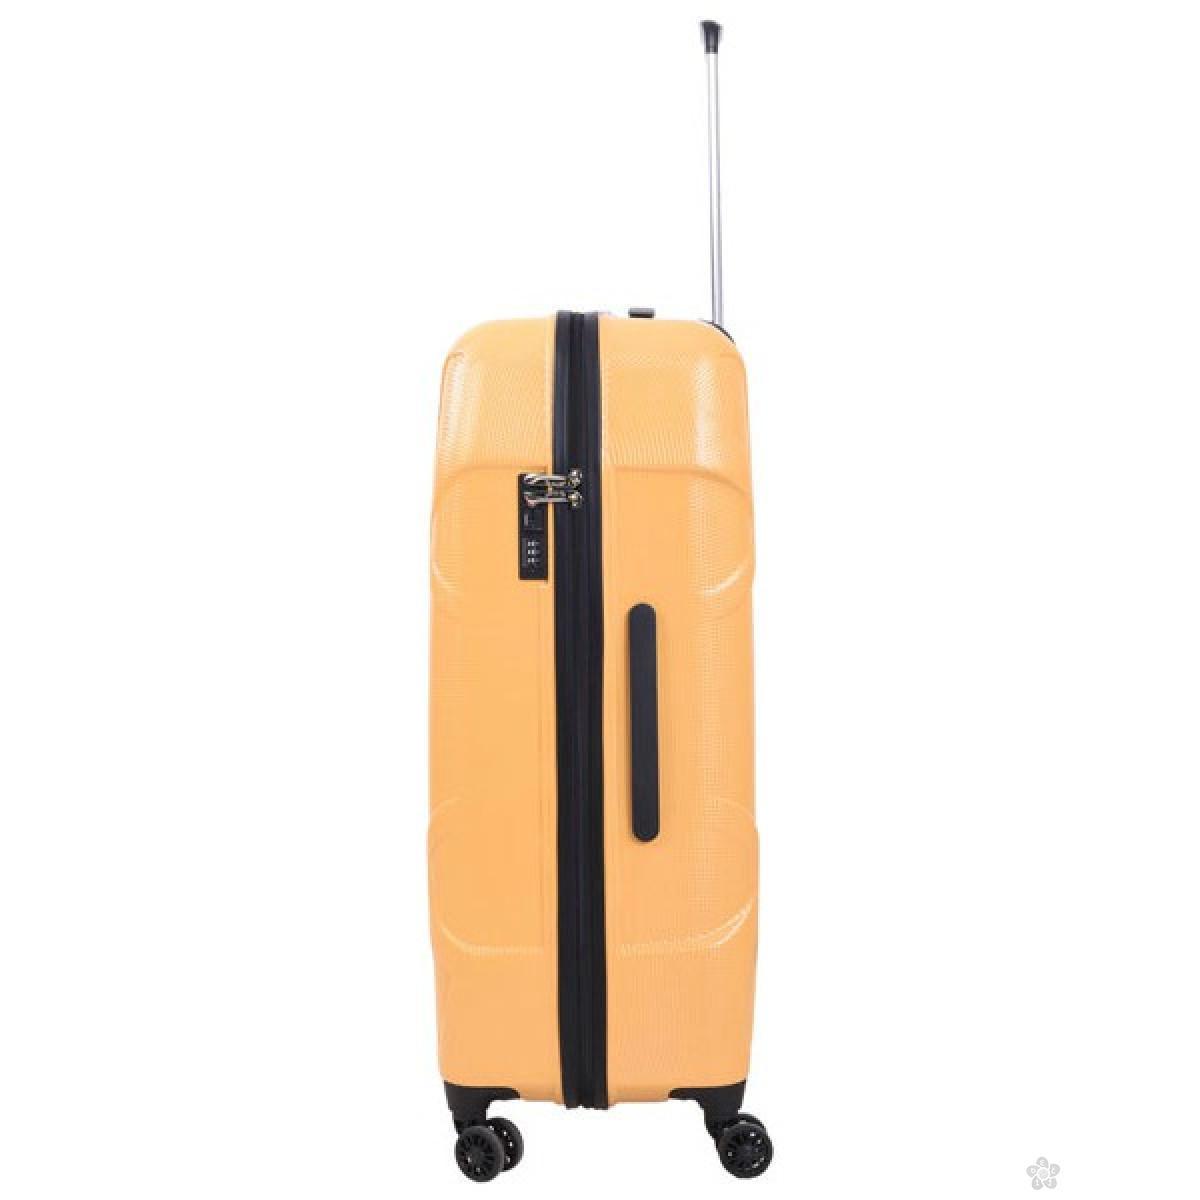 Kofer Pulse Soho žuti 28inch X21158